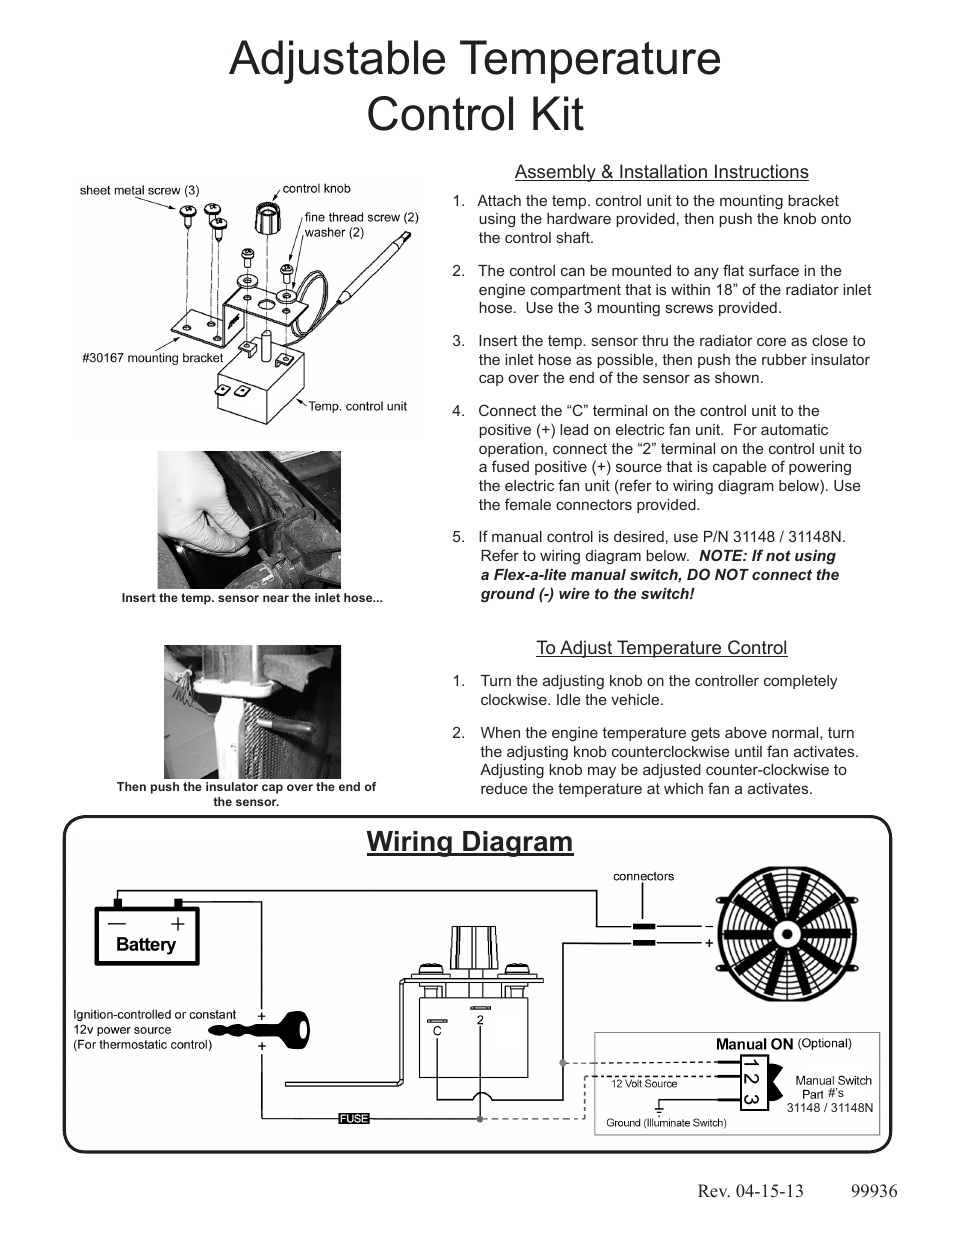 Flex-a-Lite 31147 Adjustable Temperature Control Kit User Manual   1 page   Adjustable Radiator Fan Wiring Diagram Fan Control A Flex      Manuals Directory